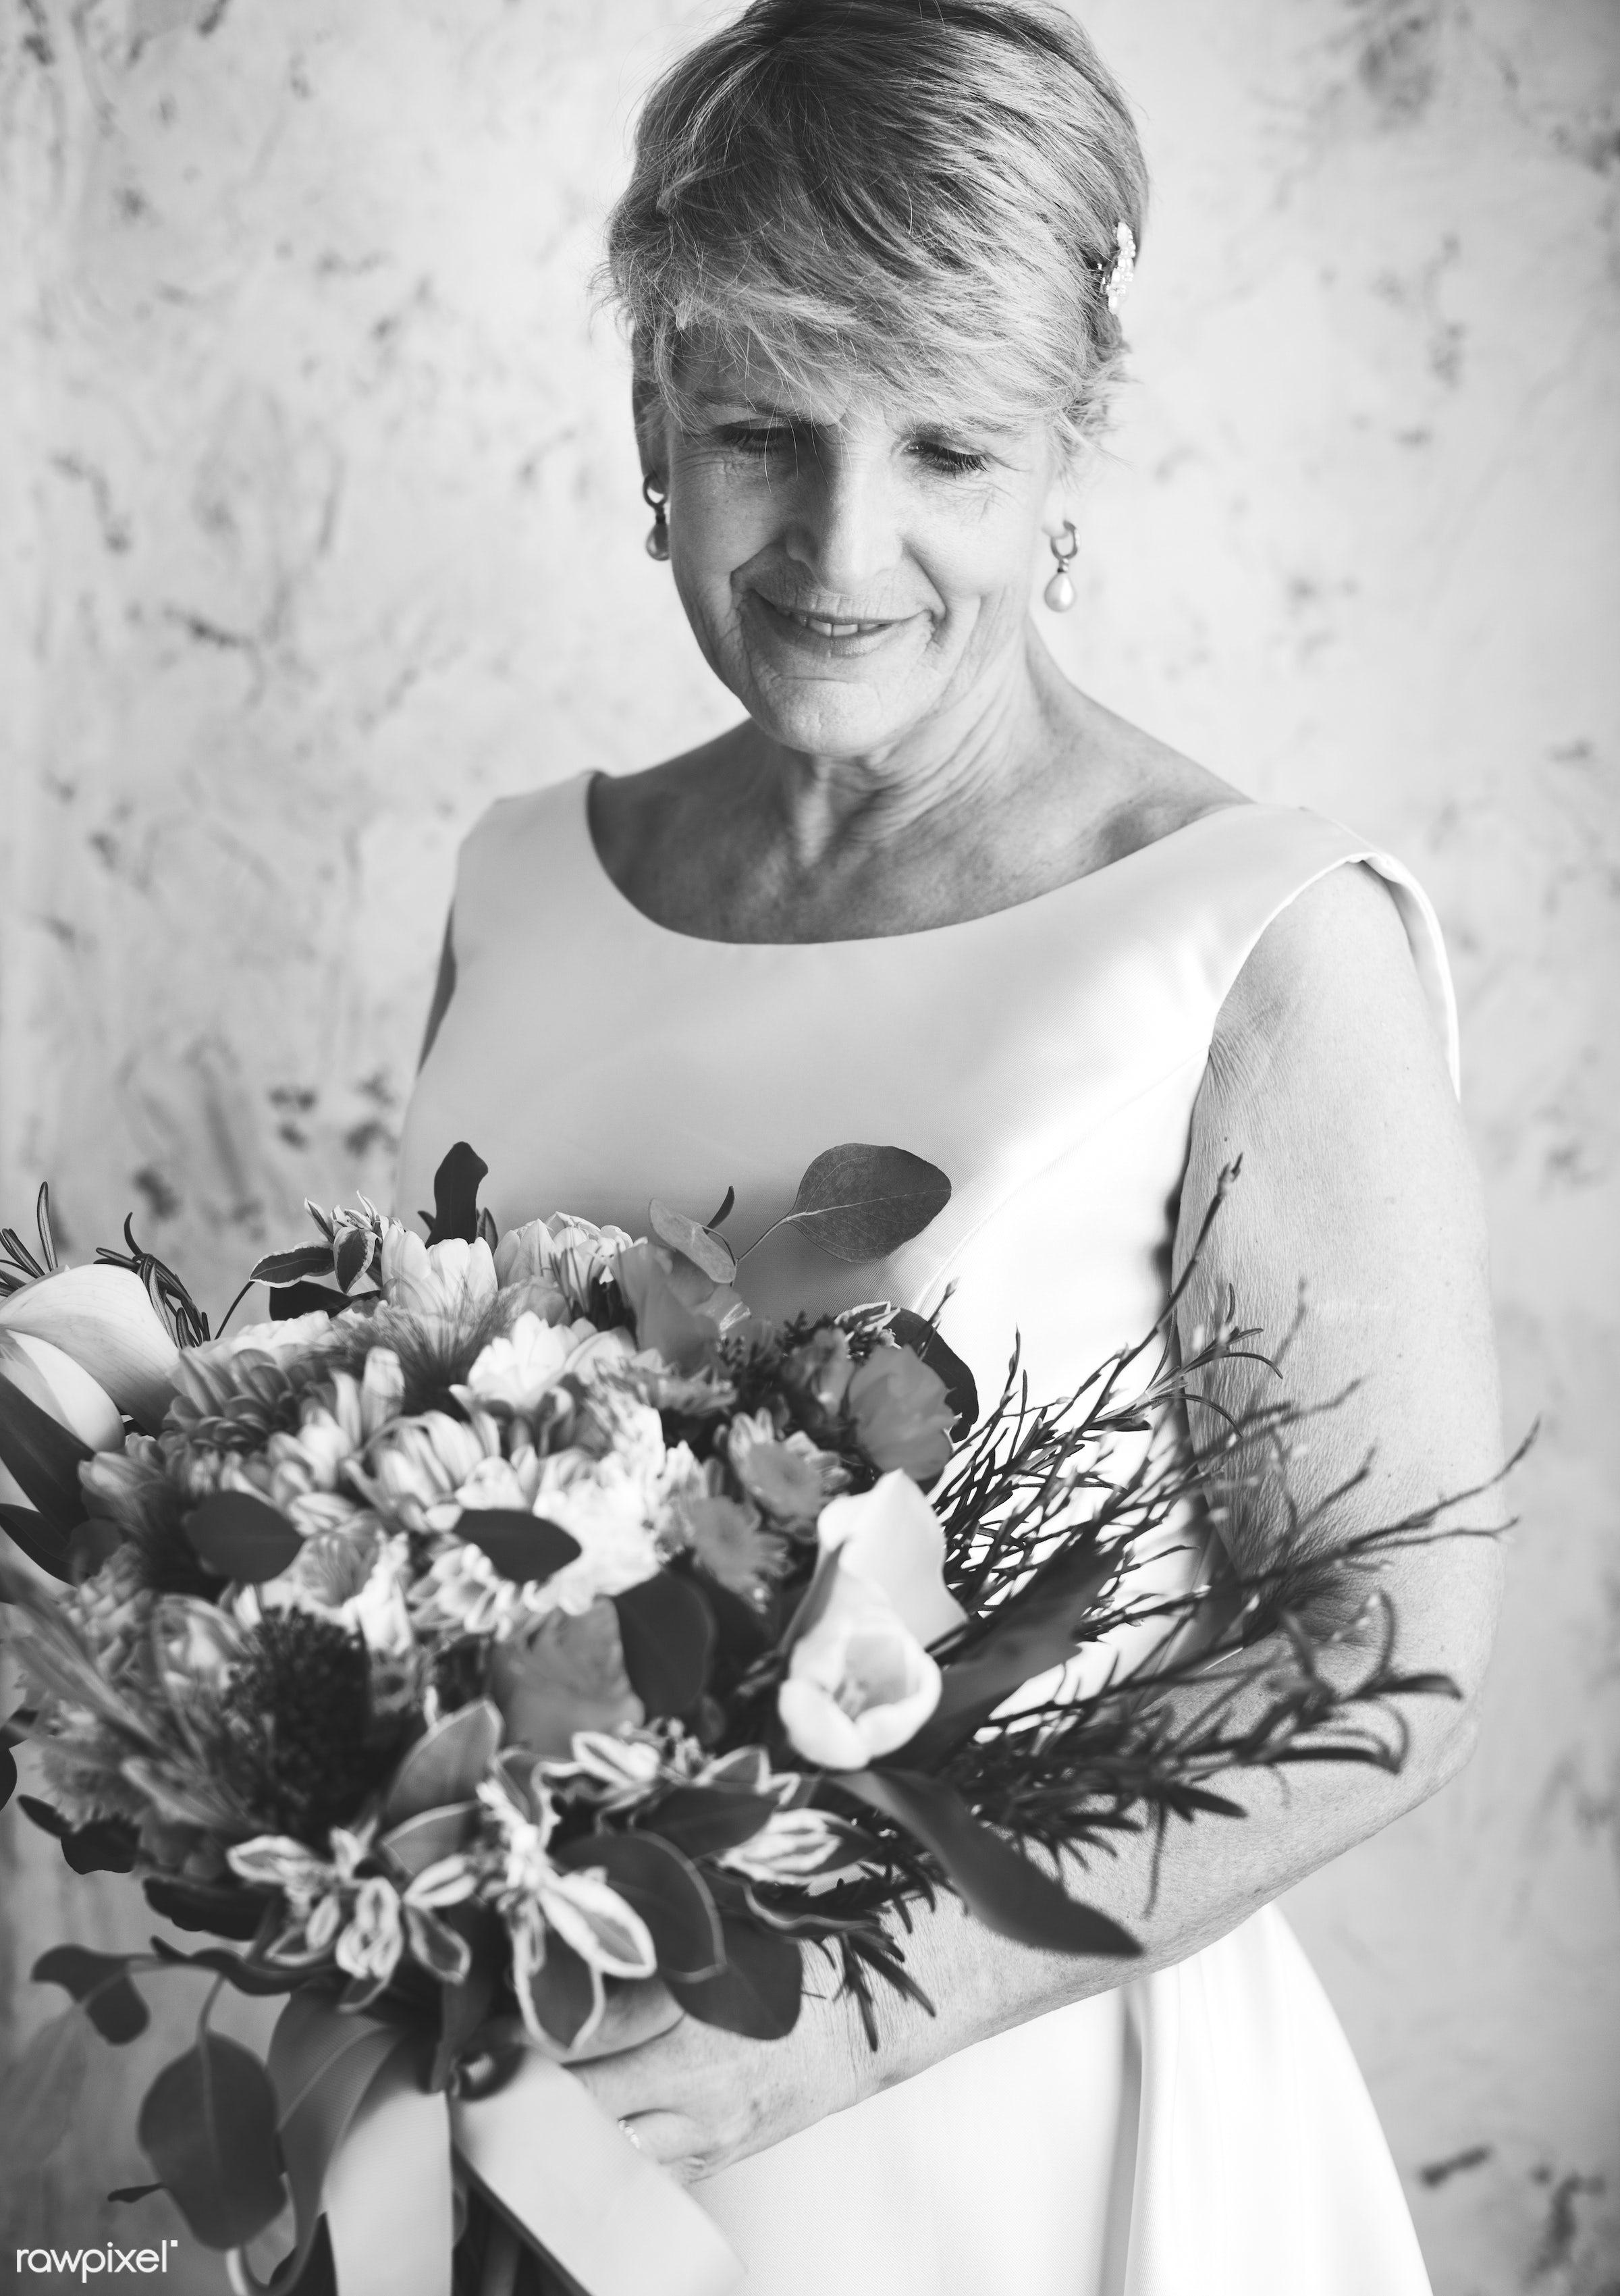 bouquet, diverse, holding, white dress, tulips, caucasian, real, nature, skimmia rubella, fresh, hands, woman, event, bride...